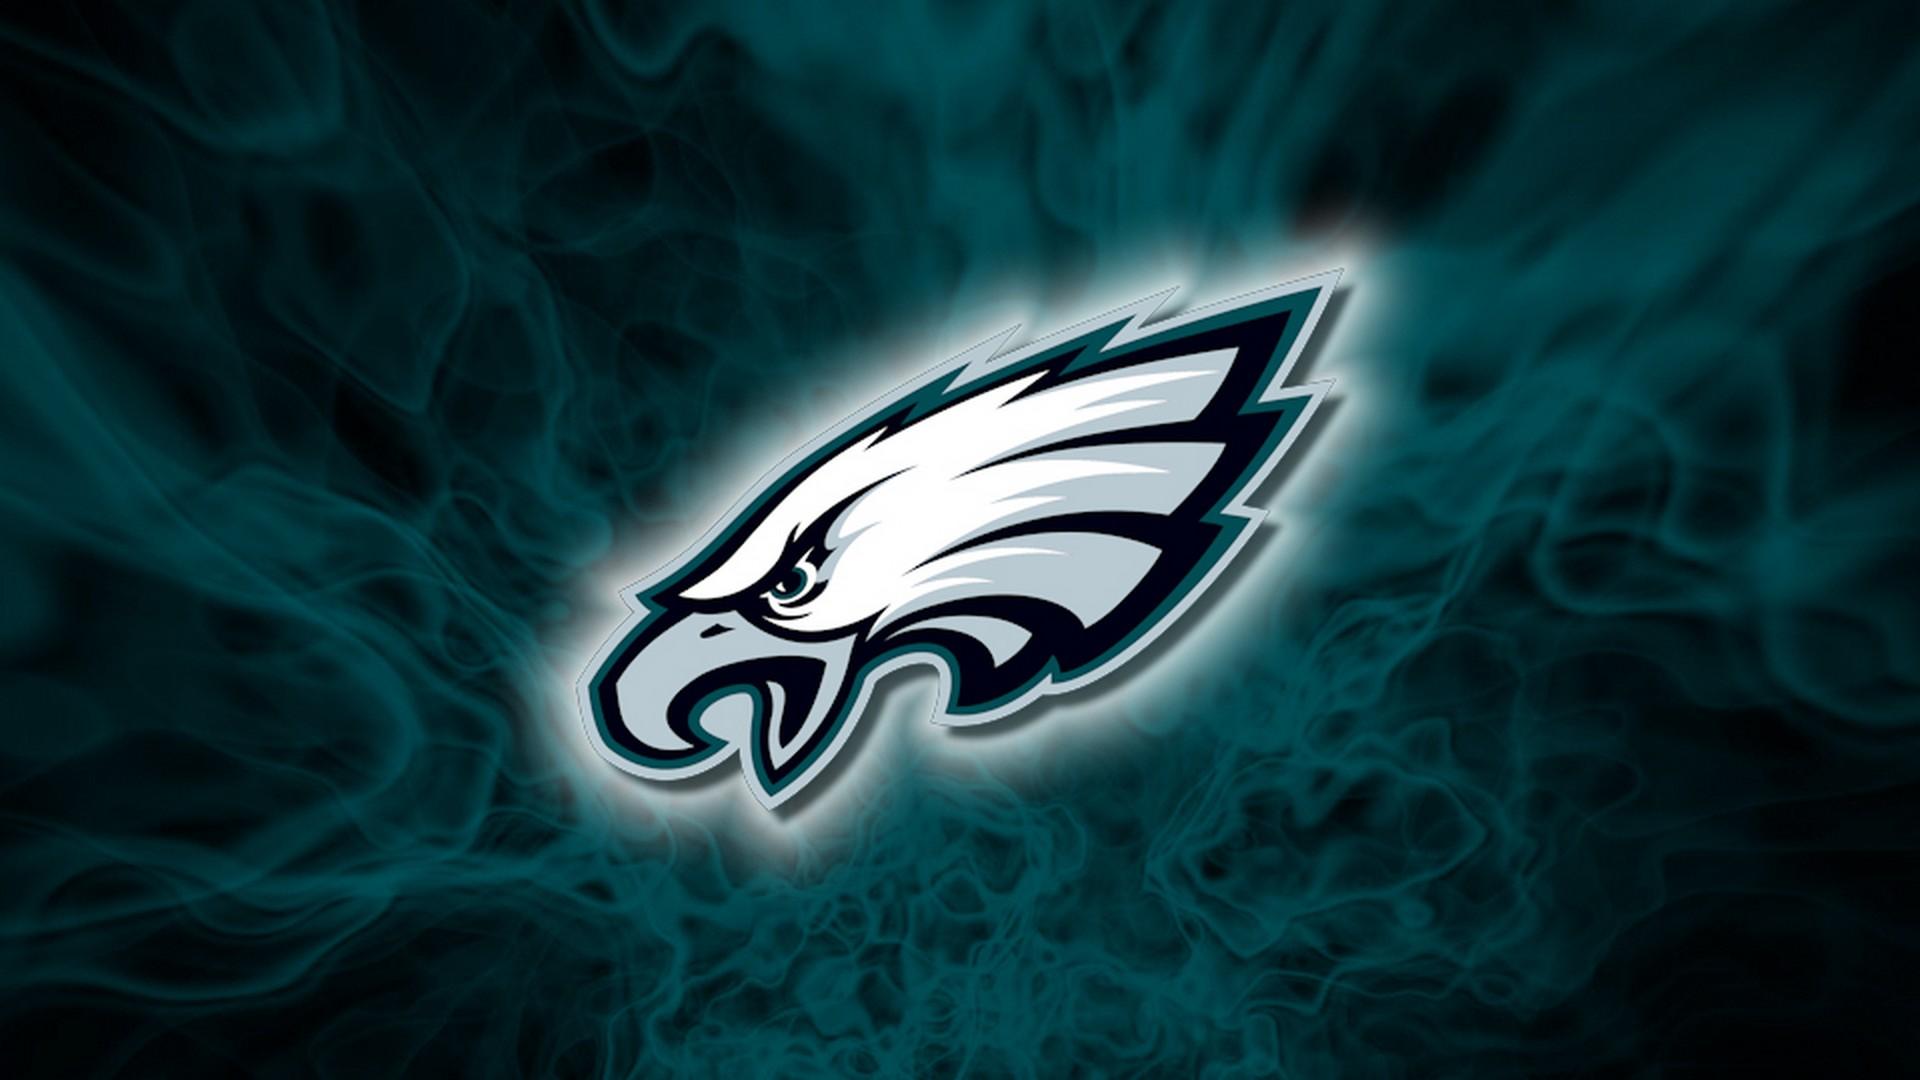 Philadelphia Eagles Wallpaper For Mac Backgrounds 2019 NFL 1920x1080